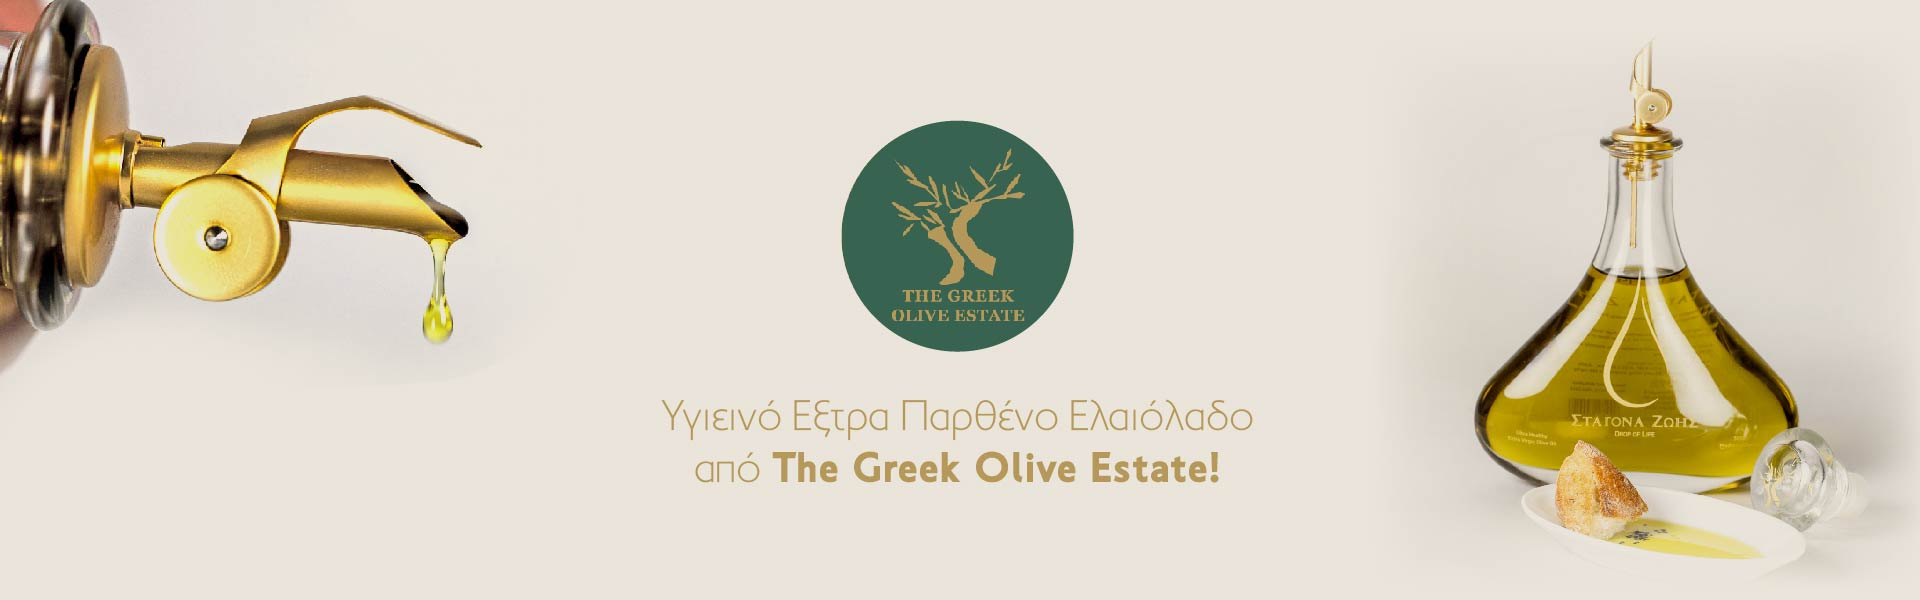 The Greek Olive Estate Υγιεινό Εξτρα Παρθένο Ελαιόλαδο Κηφισιά